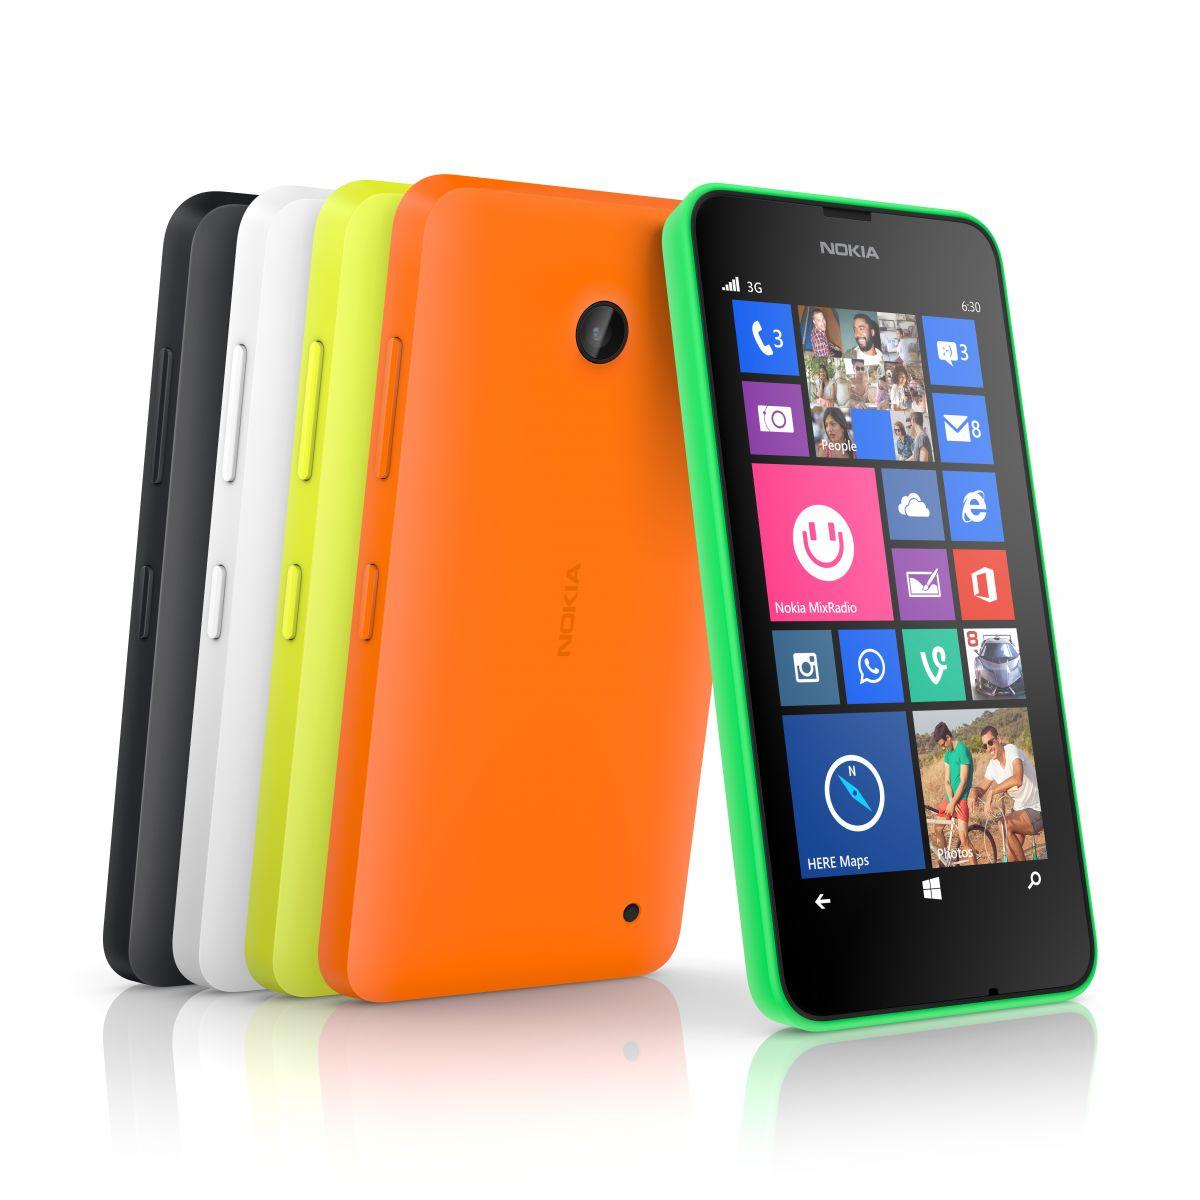 Nokia julkisti uudet edulliset Windows-puhelimet: Lumia 630 ja 635 - Puhelinvertailu